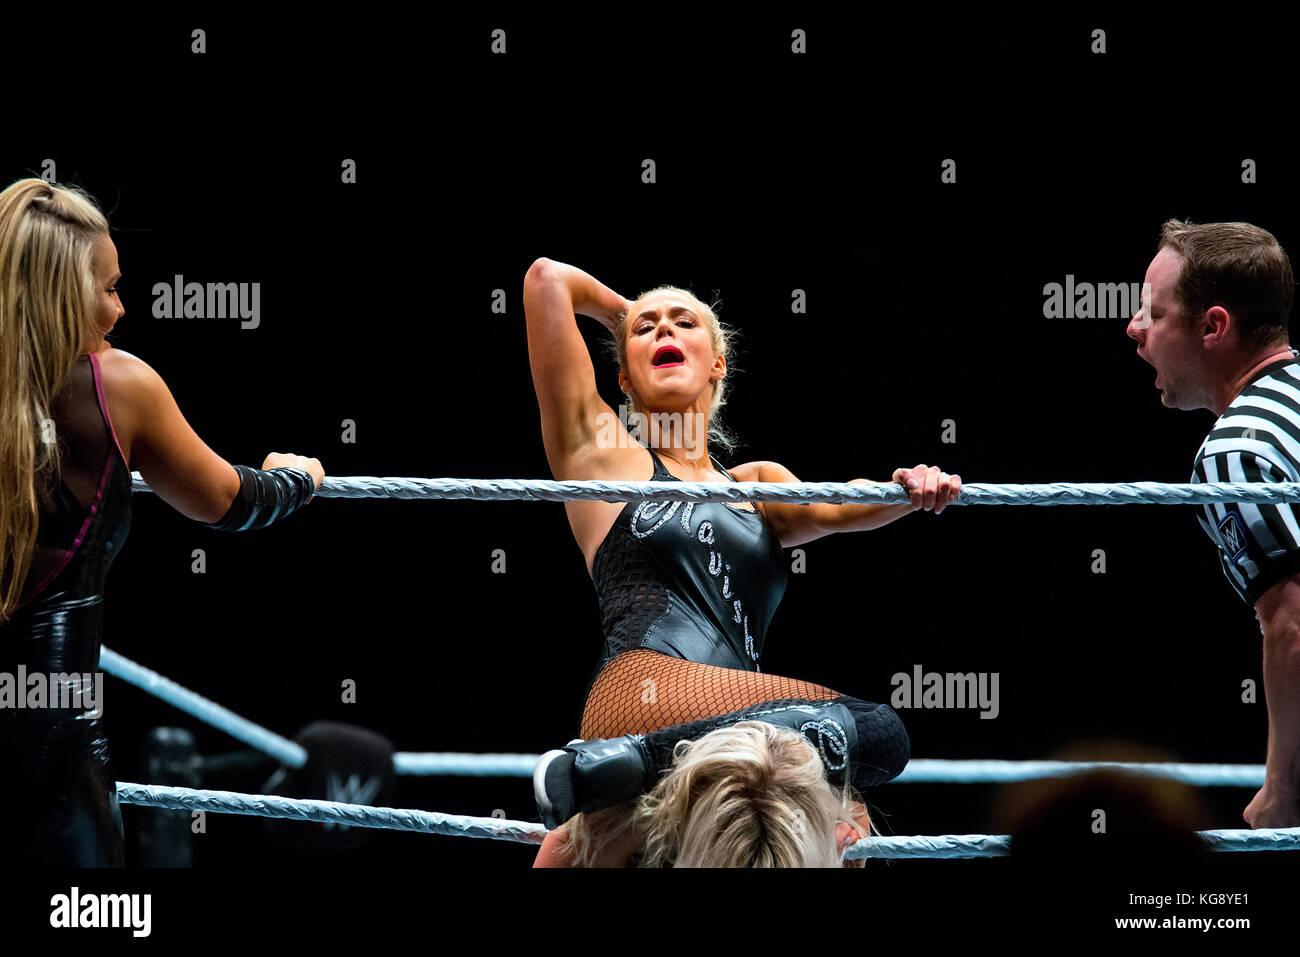 BARCELONA - NOV 4: The wrestler Charlotte Flair in action at WWE Live at the Palau Sant Jordi on November 4, 2017 - Stock Image